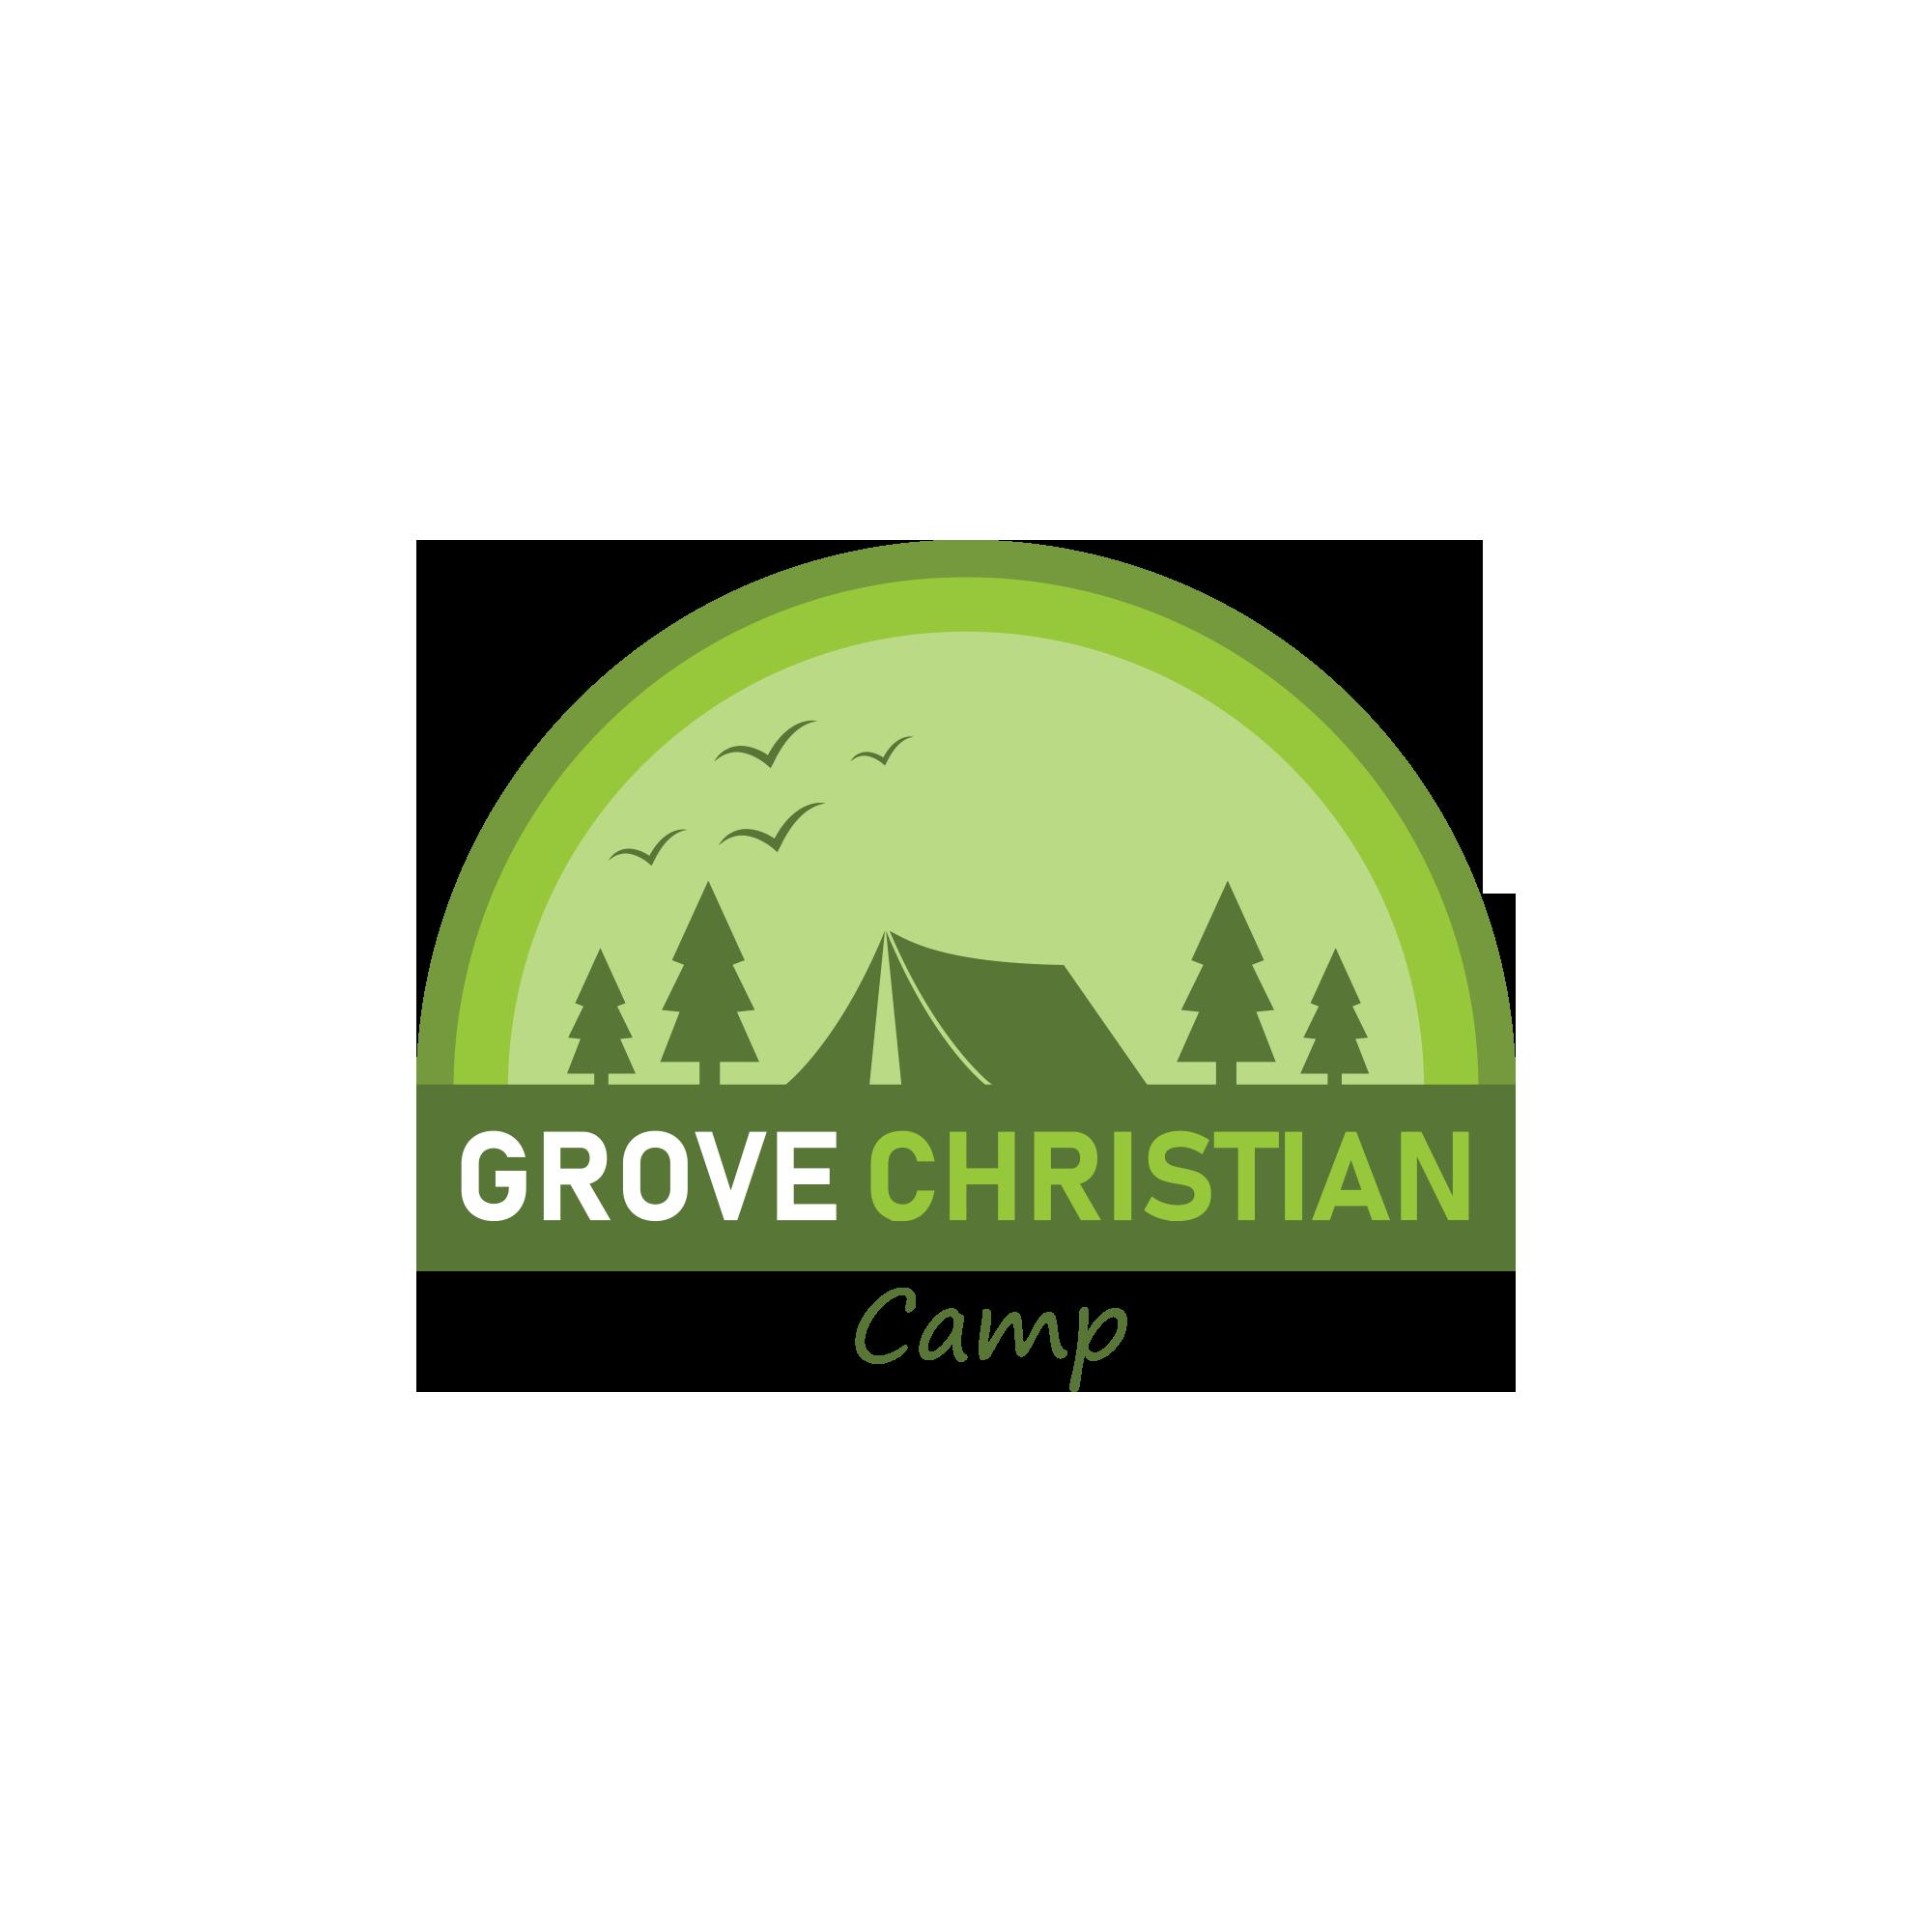 Grove Christian Camp Transparent.png